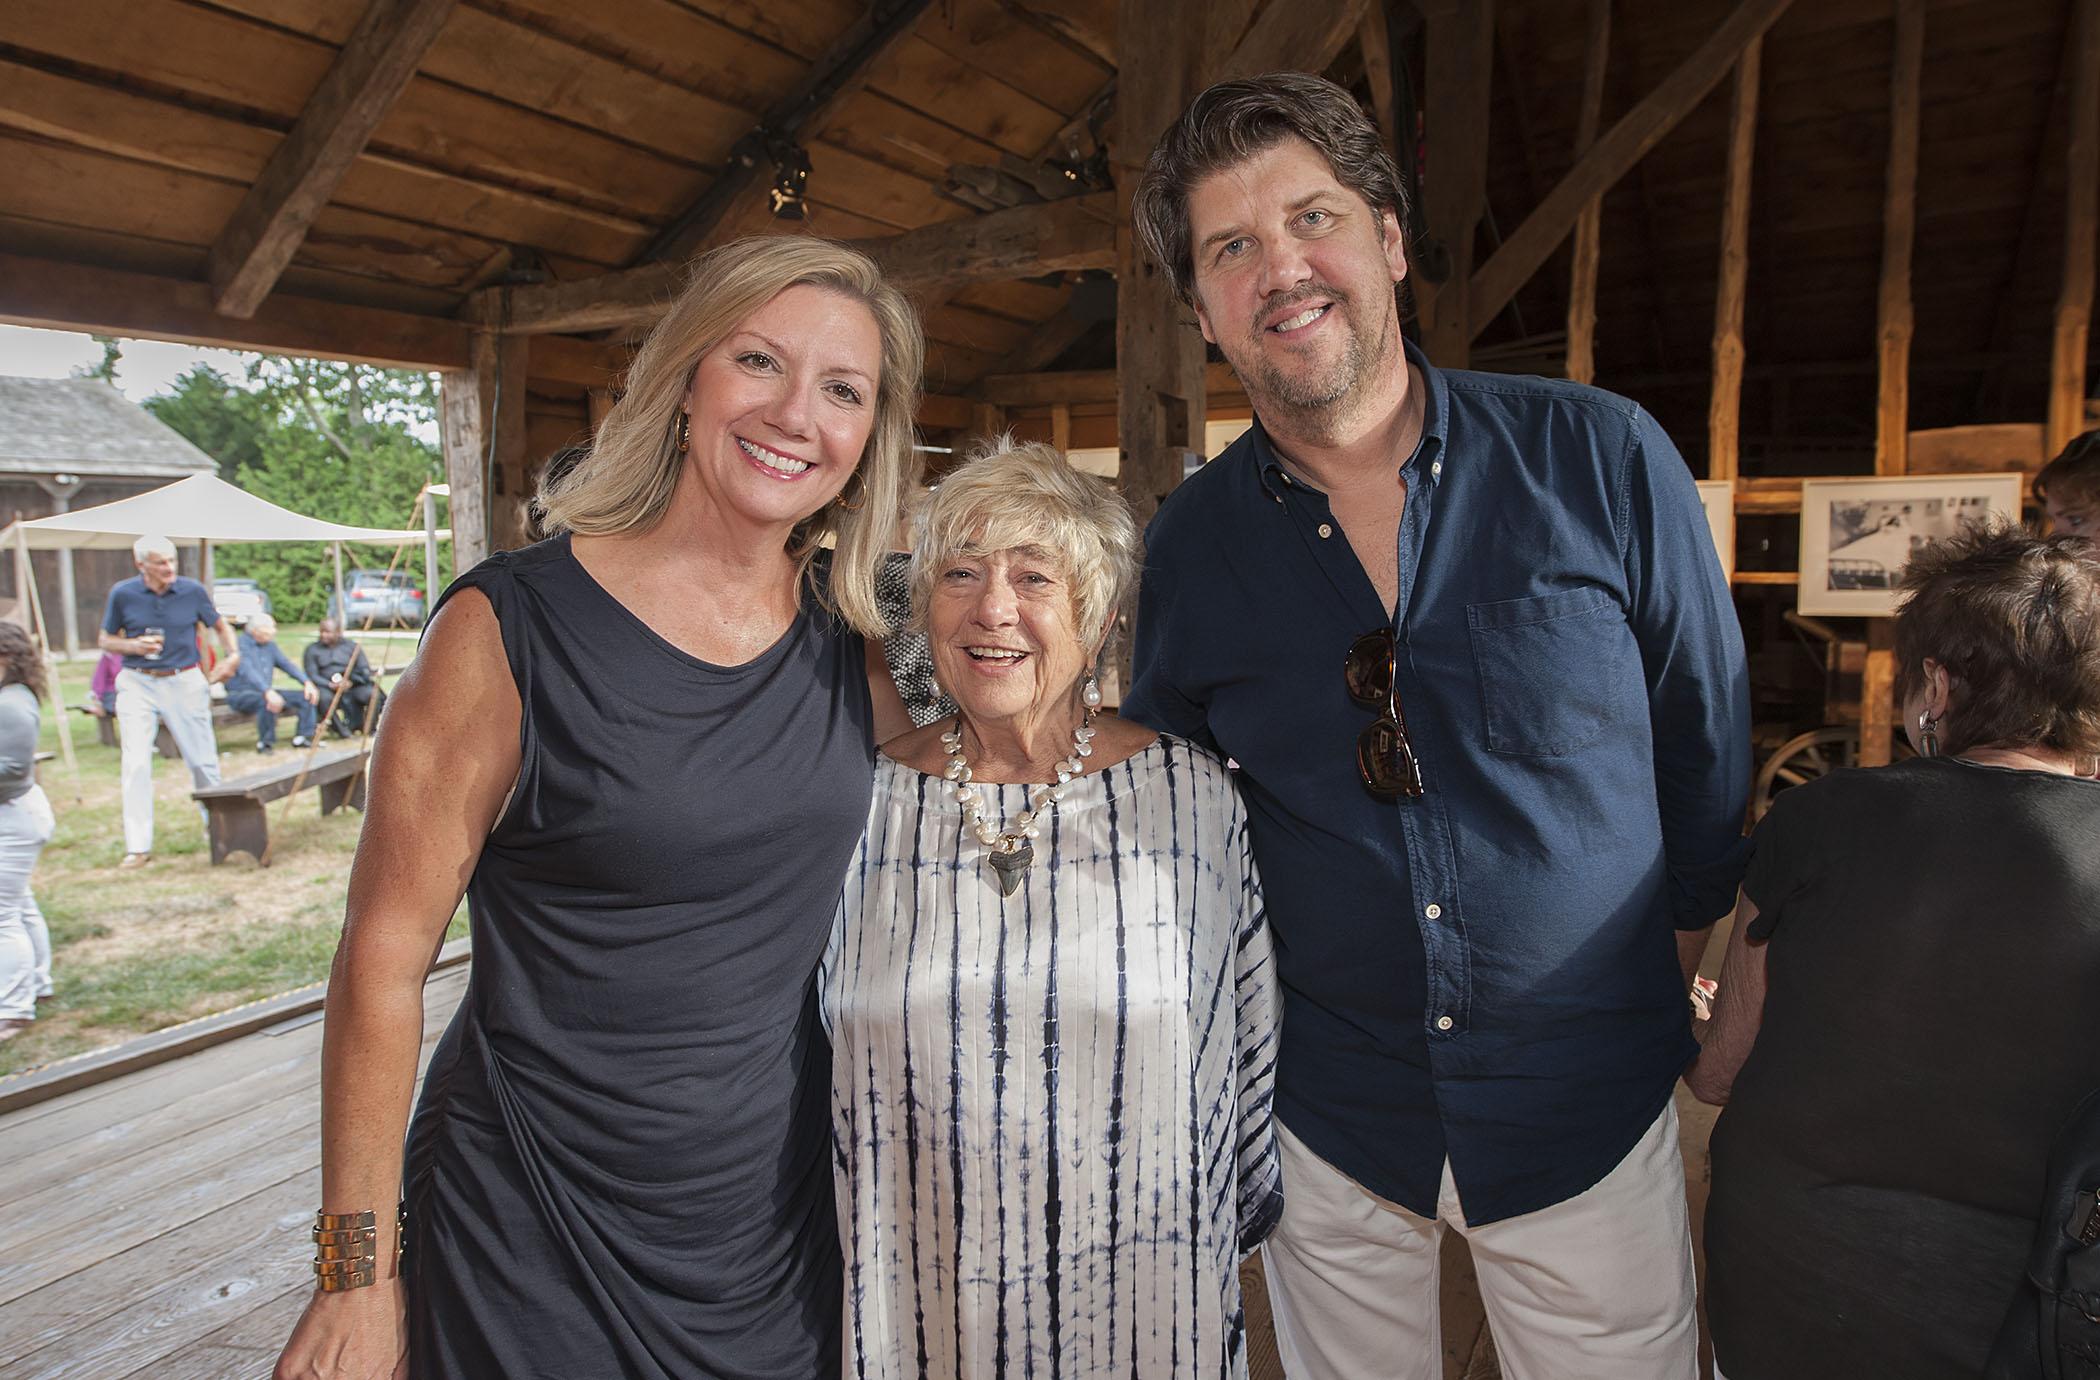 Anne Chaisson (Director of Hamptons Int'l Film Festival) Susan Wood and Jeff Gillis (credit: michael heller)